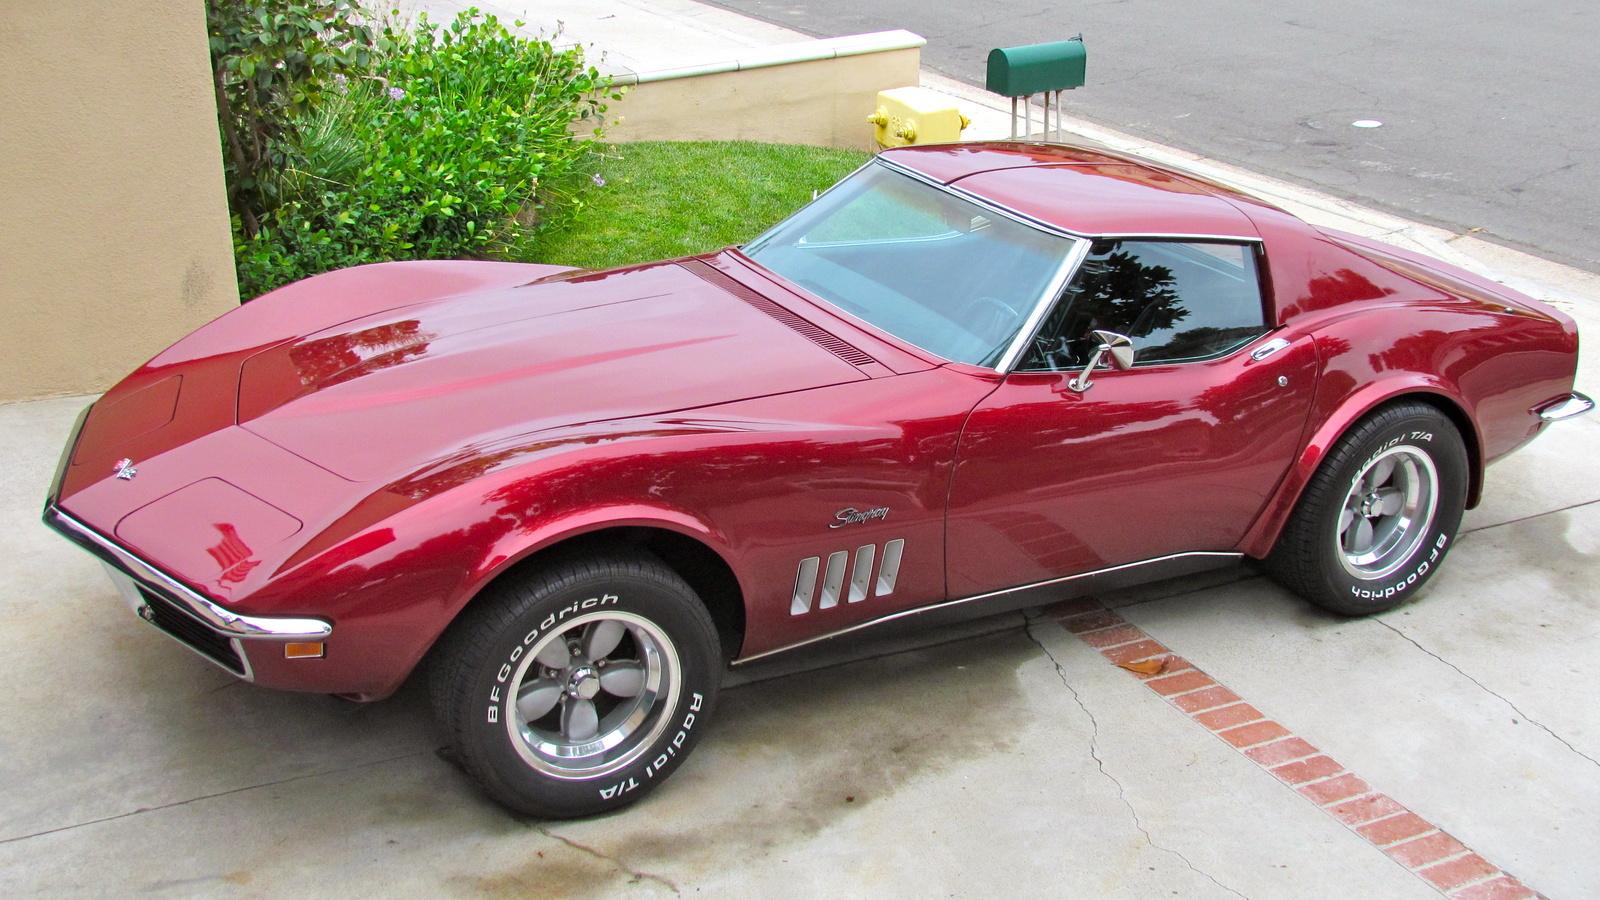 Cruze chevy cruze 0-60 : Chevrolet Corvette Questions - 0 - 60 times for 2007 corvette ...